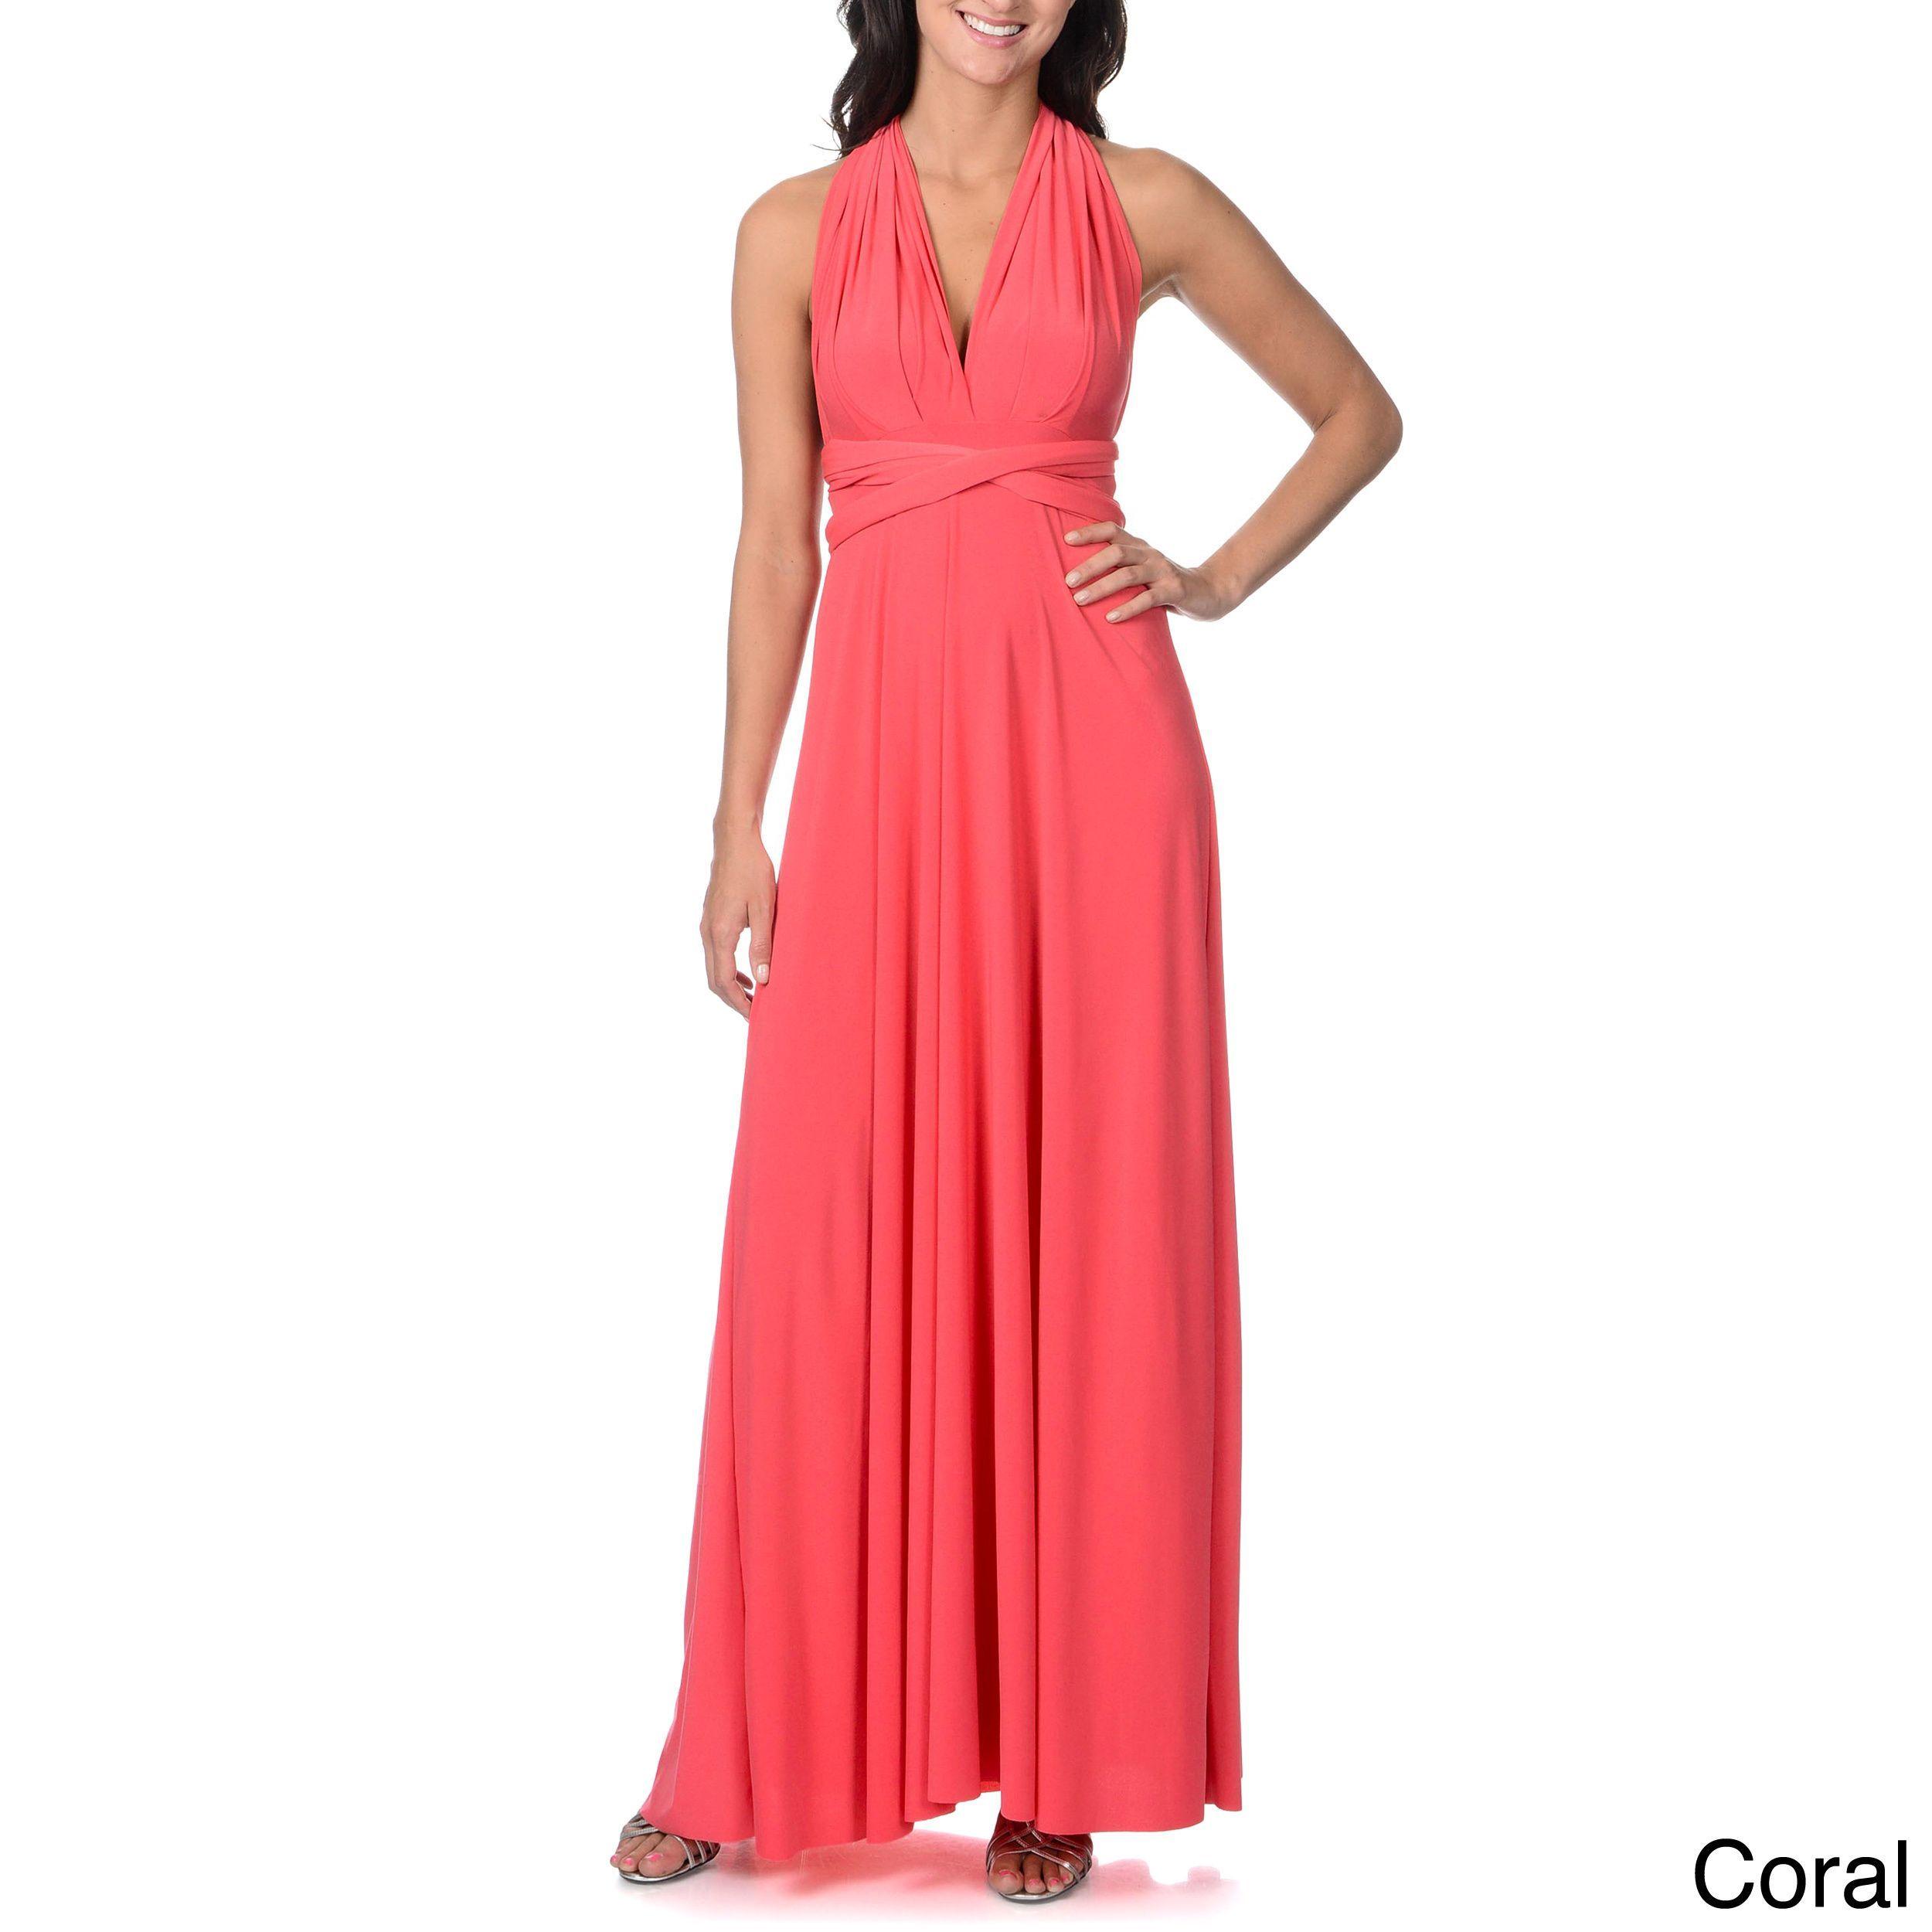 Von ronen new york womenus long transformer dress fits